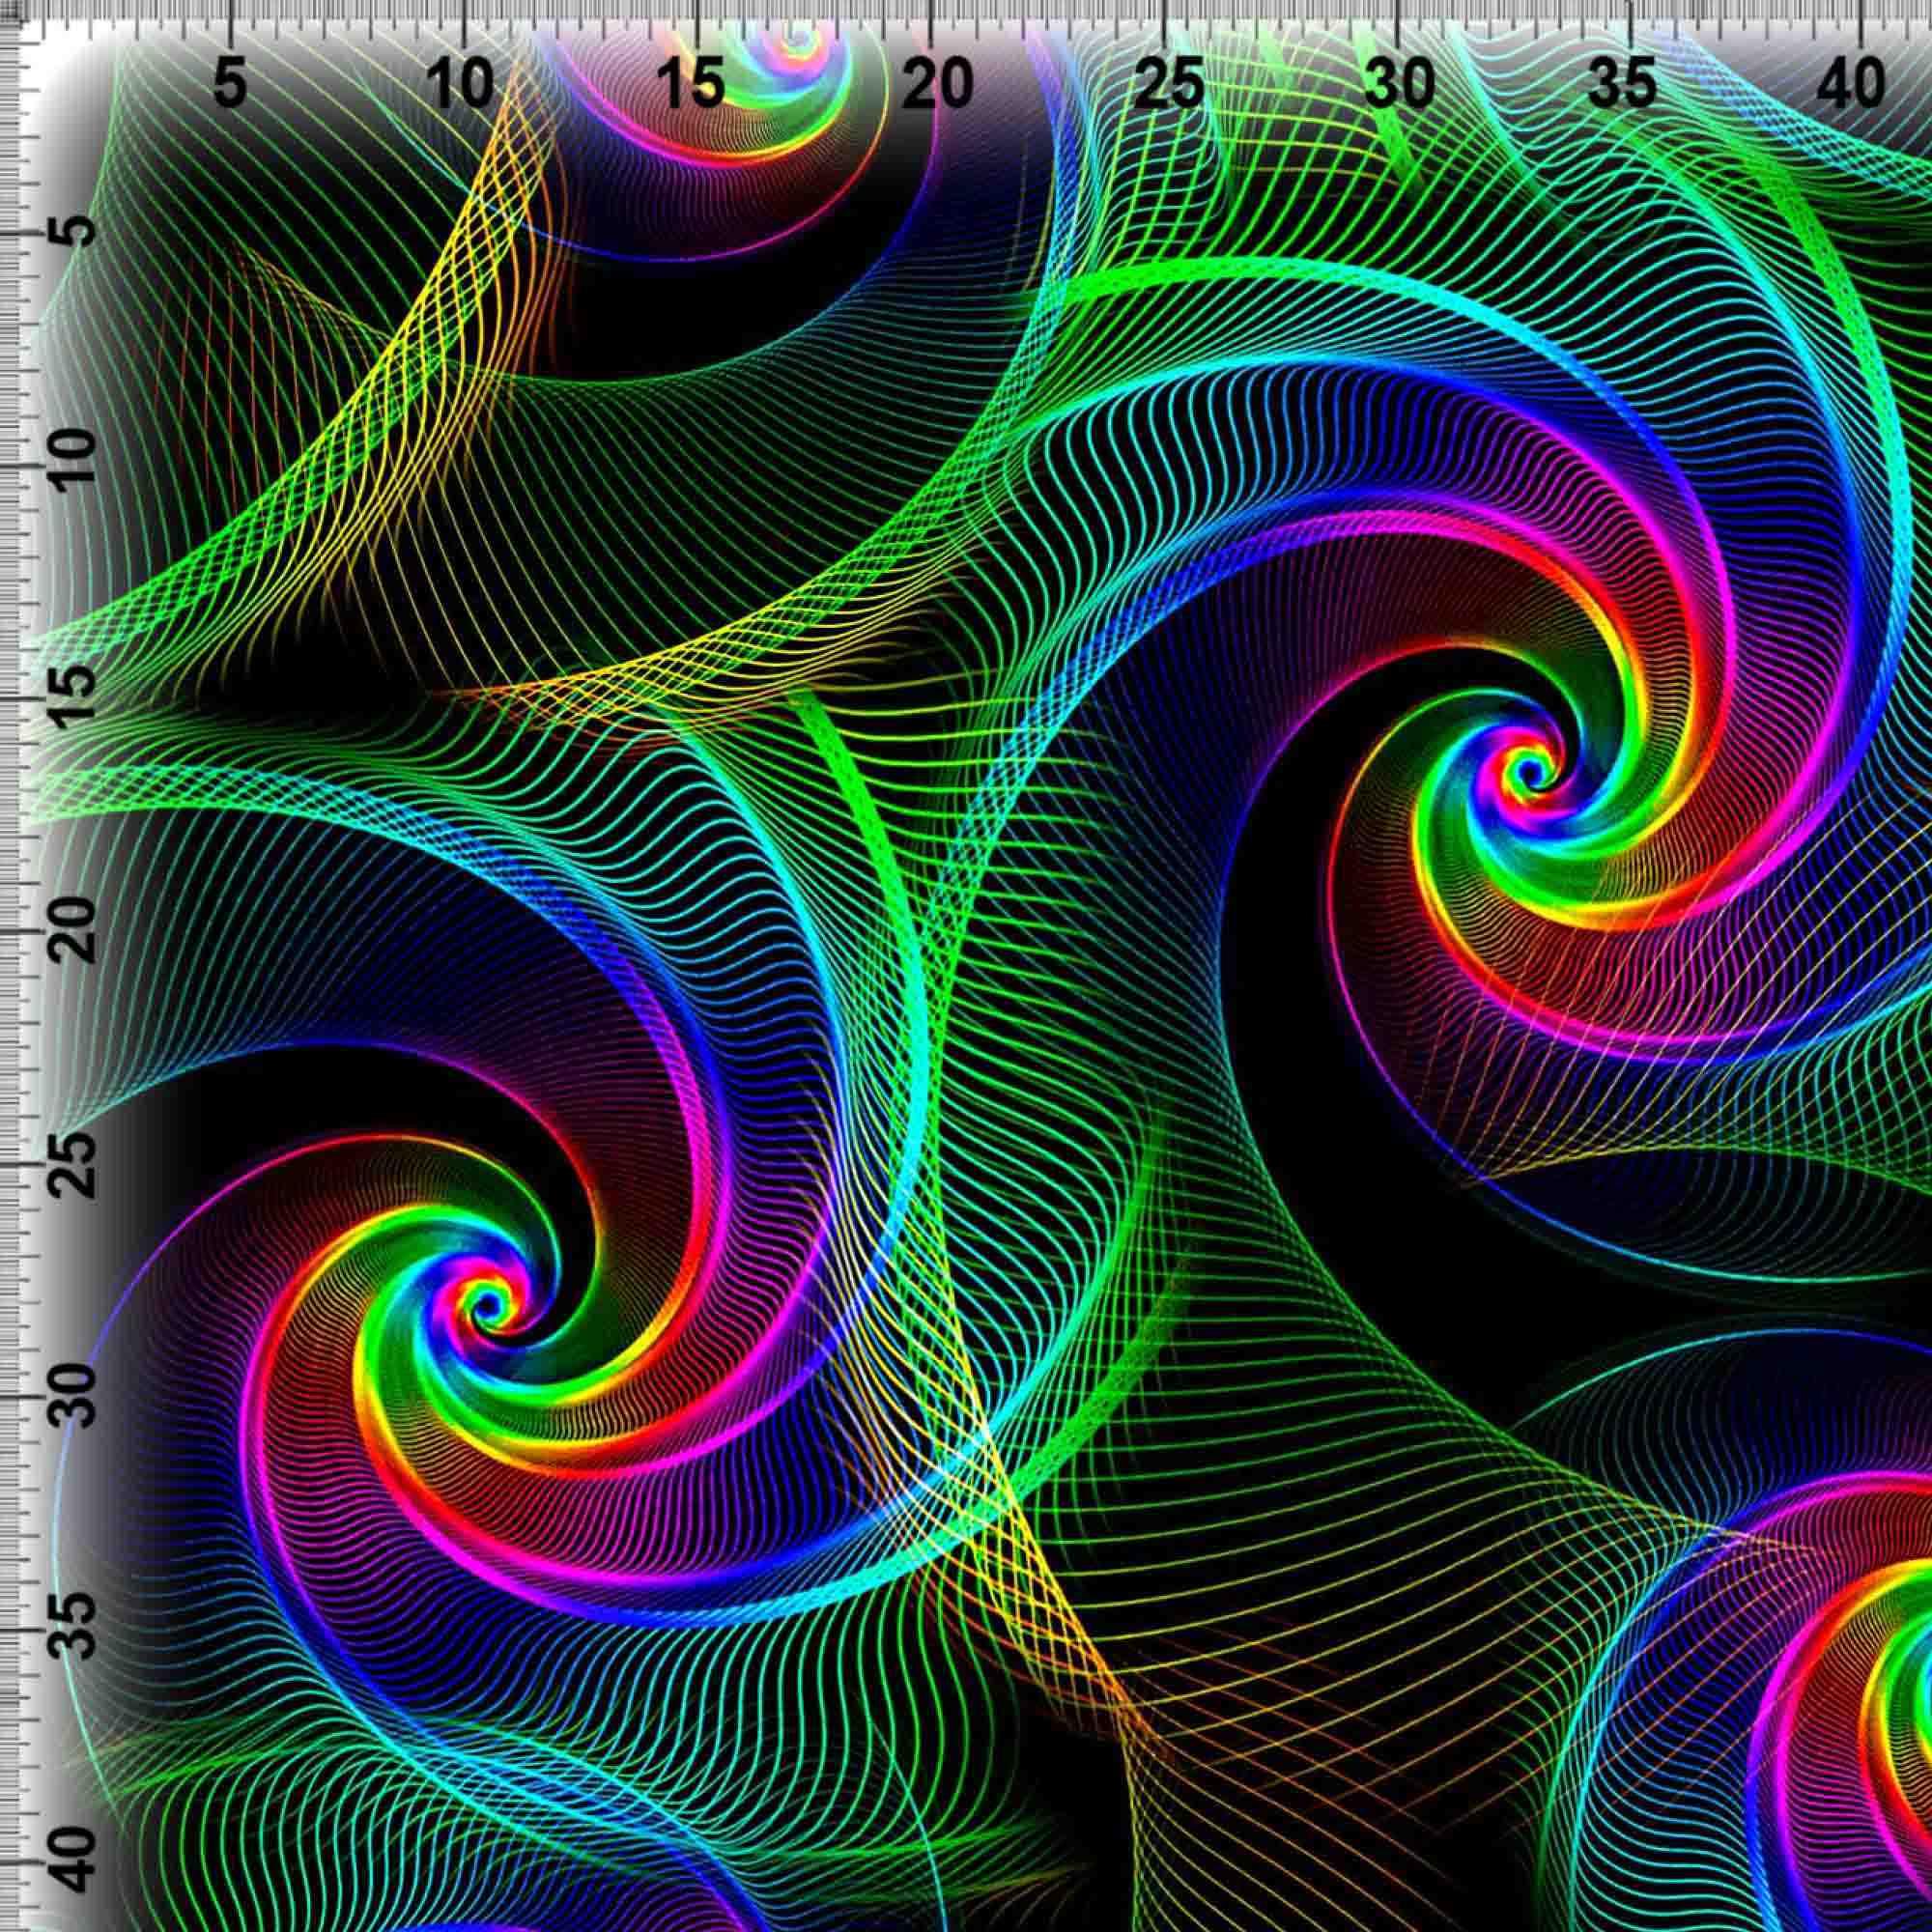 Meryl Digital Estampado (59210-1)